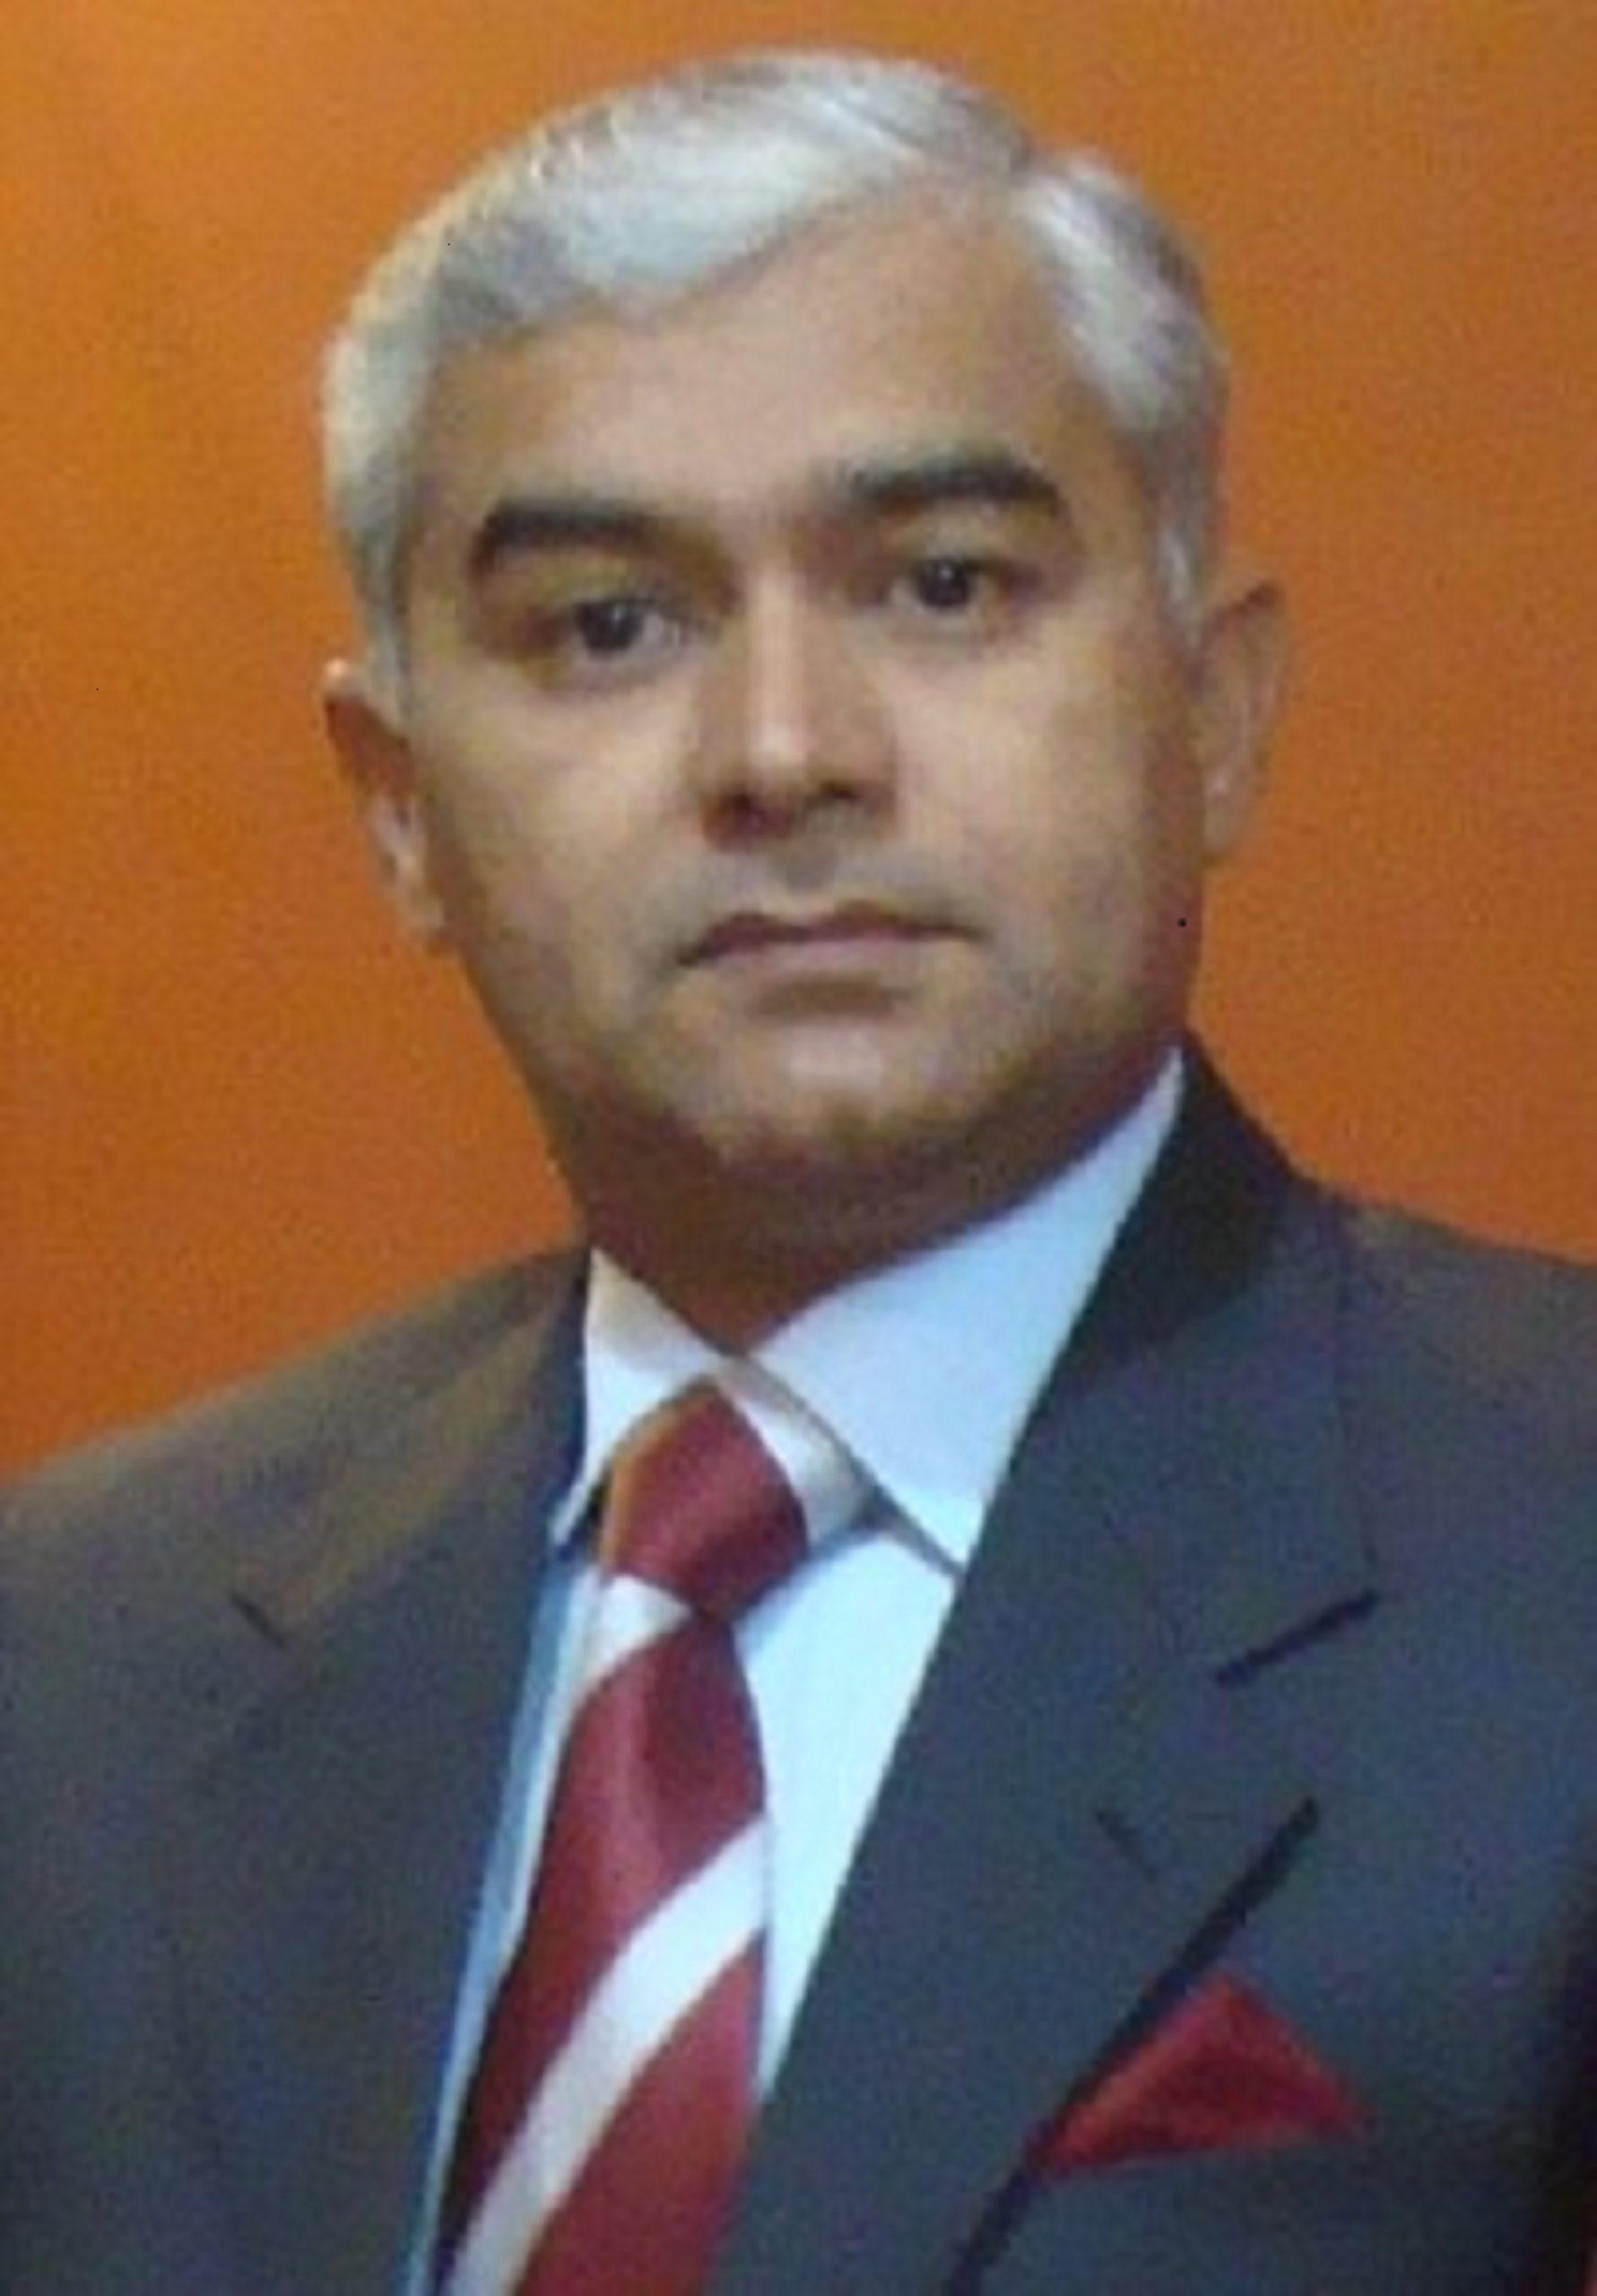 Colonel Deepak Kumar